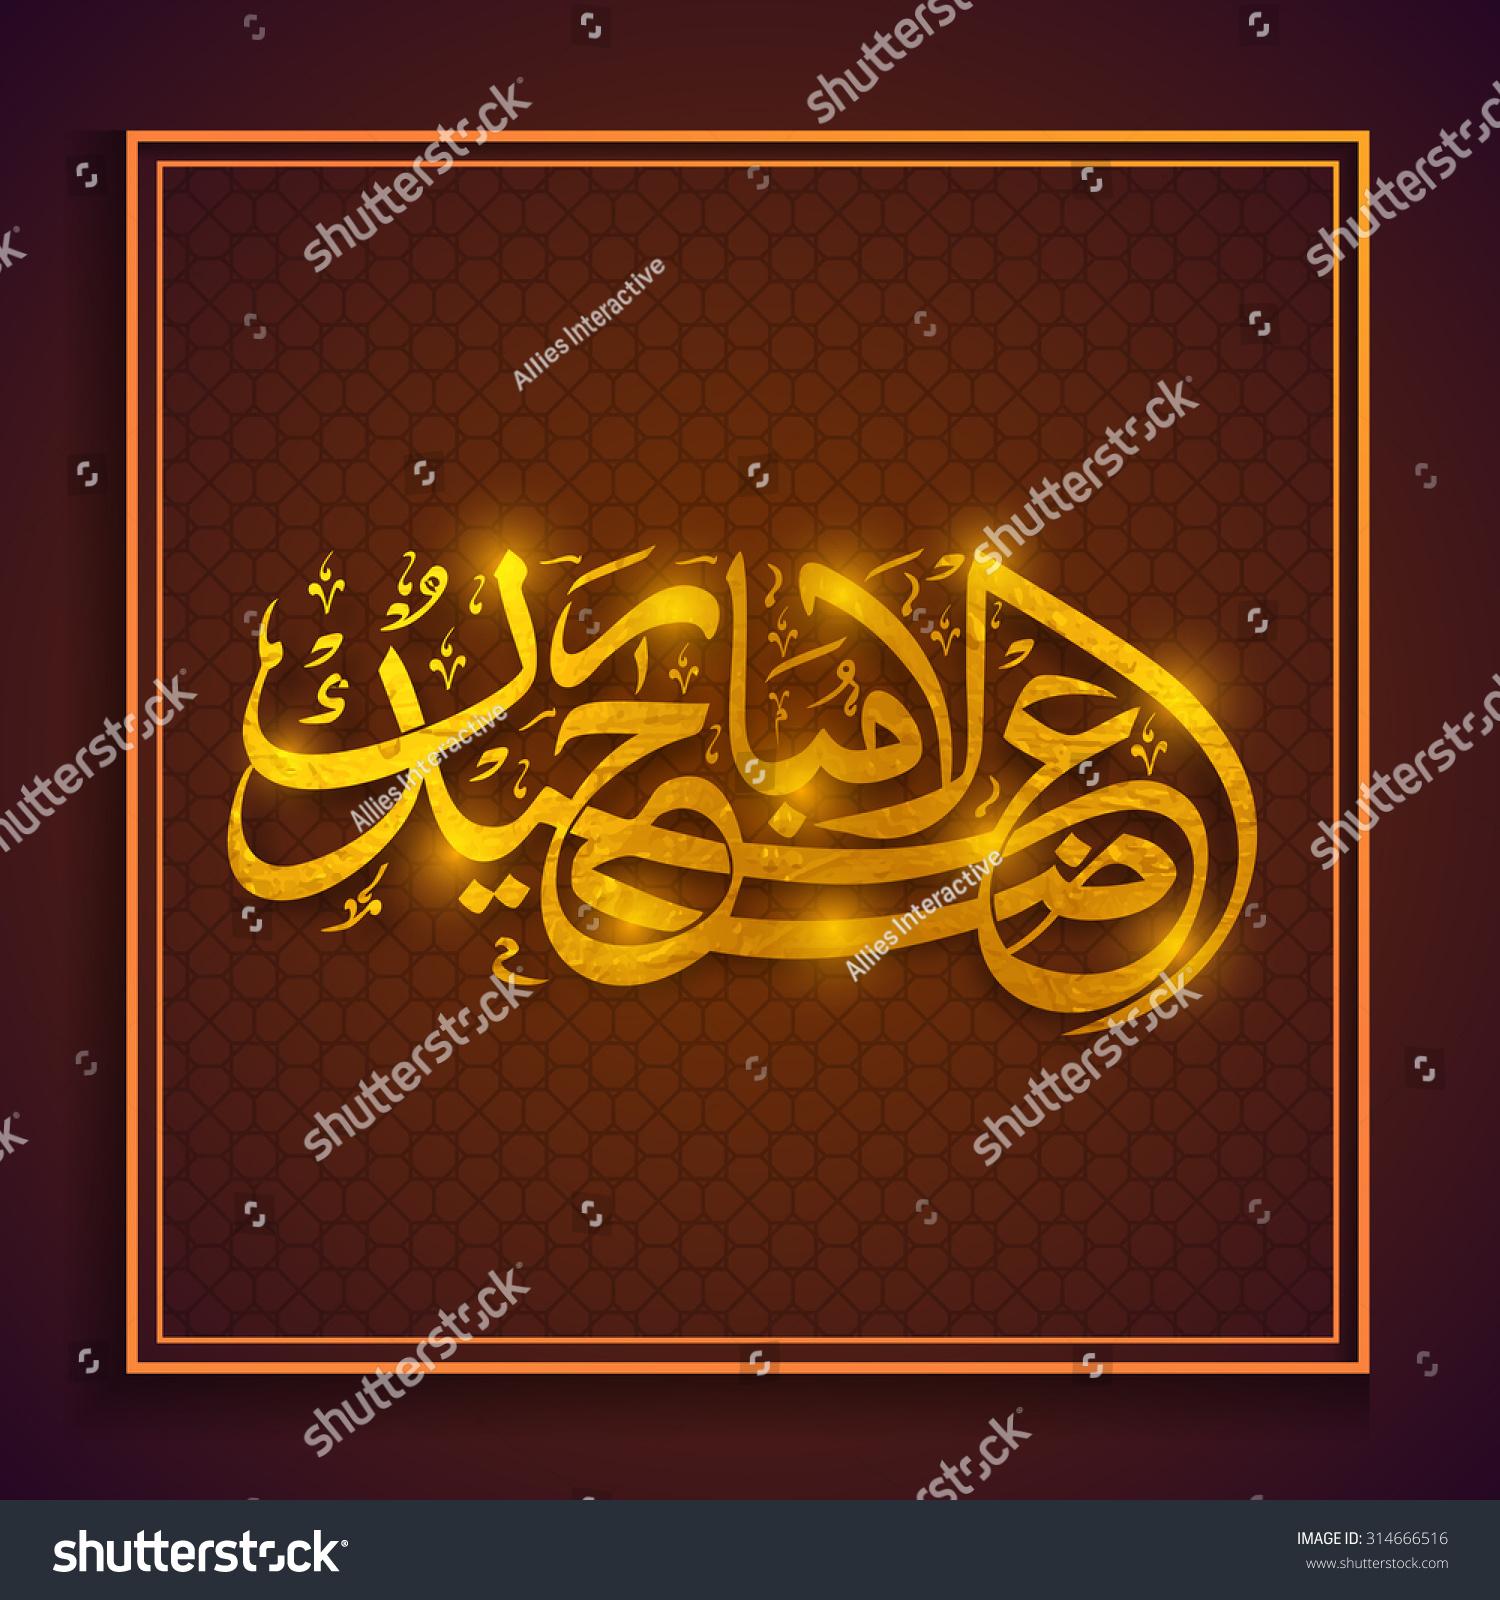 Royalty Free Elegant Greeting Card Design With Shiny 314666516